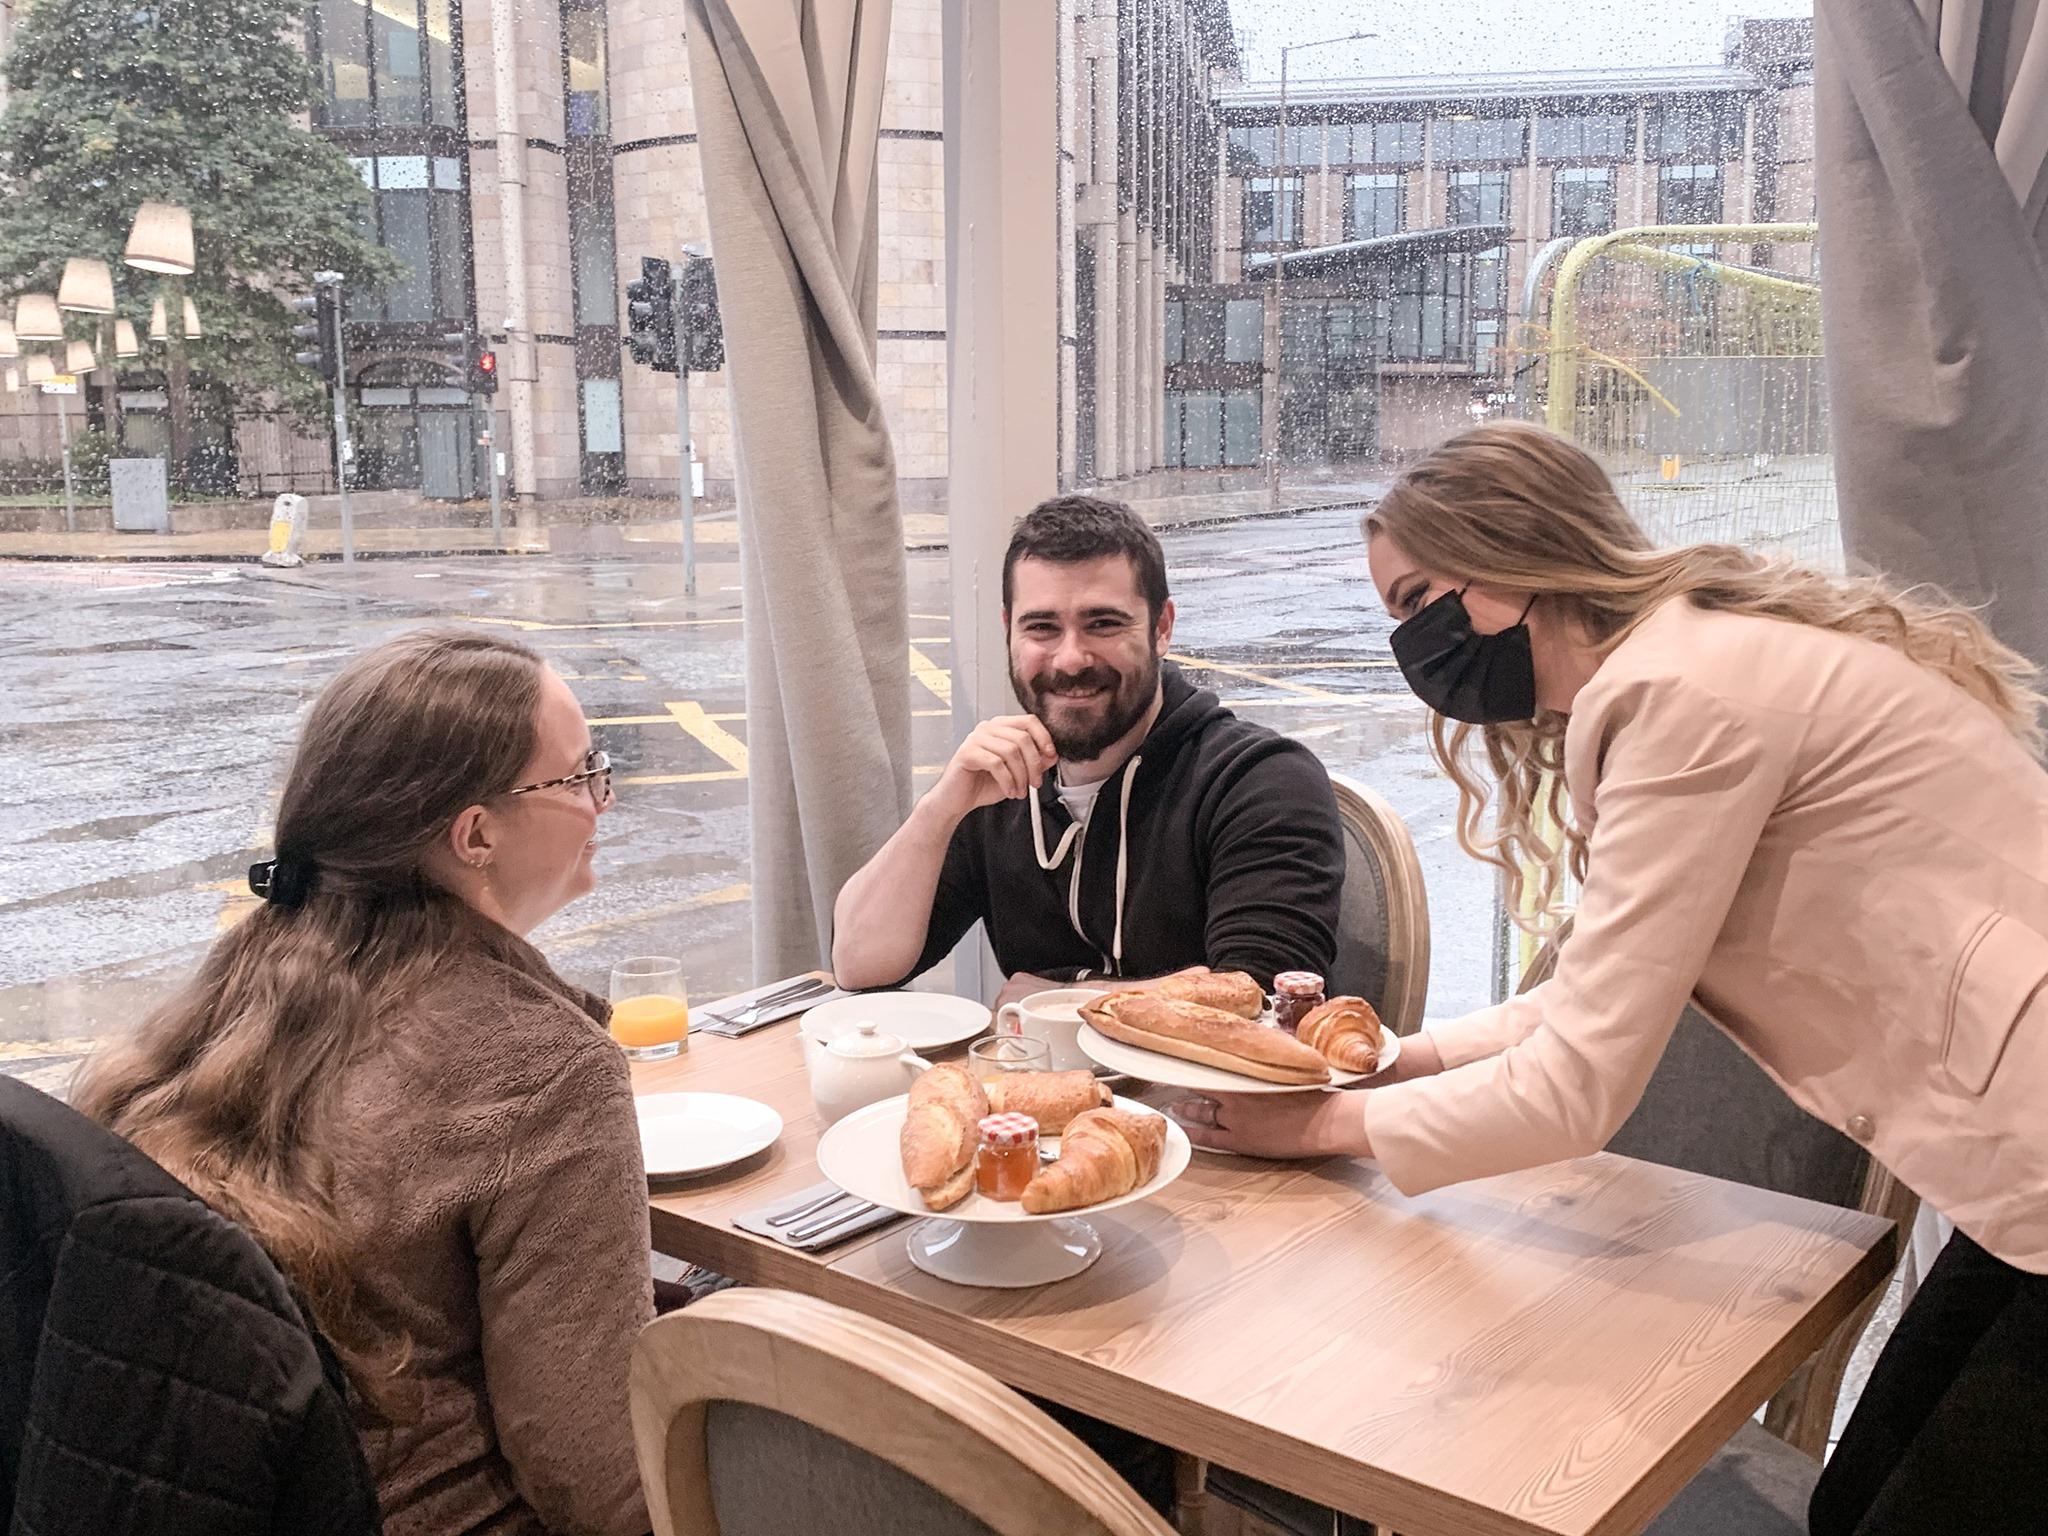 Le Petit Café, Edimbourg